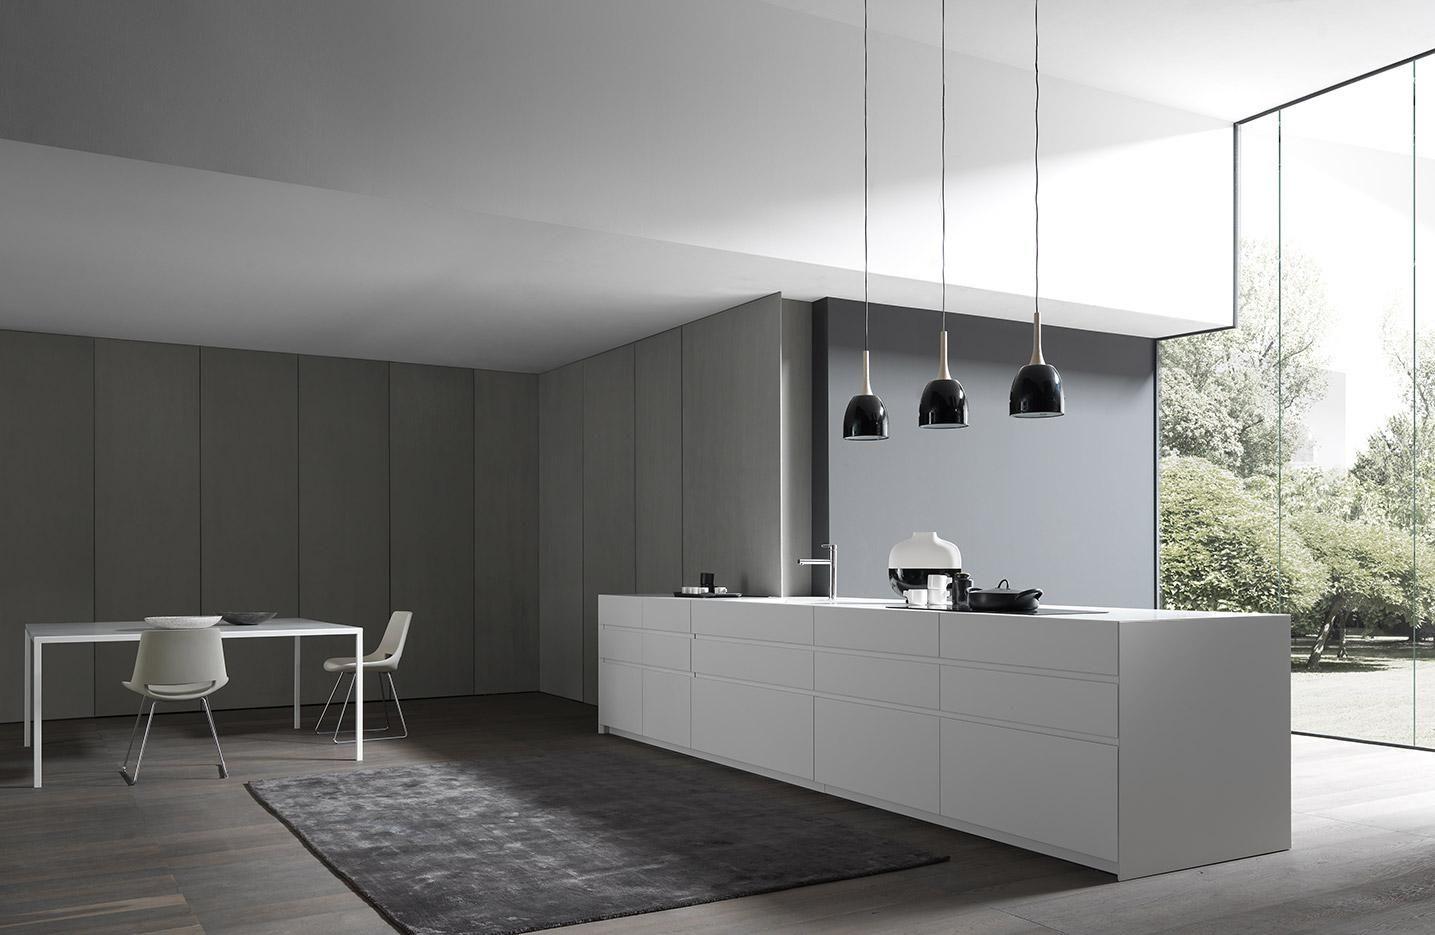 Fly design kitchen program. All the edges match, PERFECTLY.   www.modulnova.it #designkitchen #designliving #interiordesign